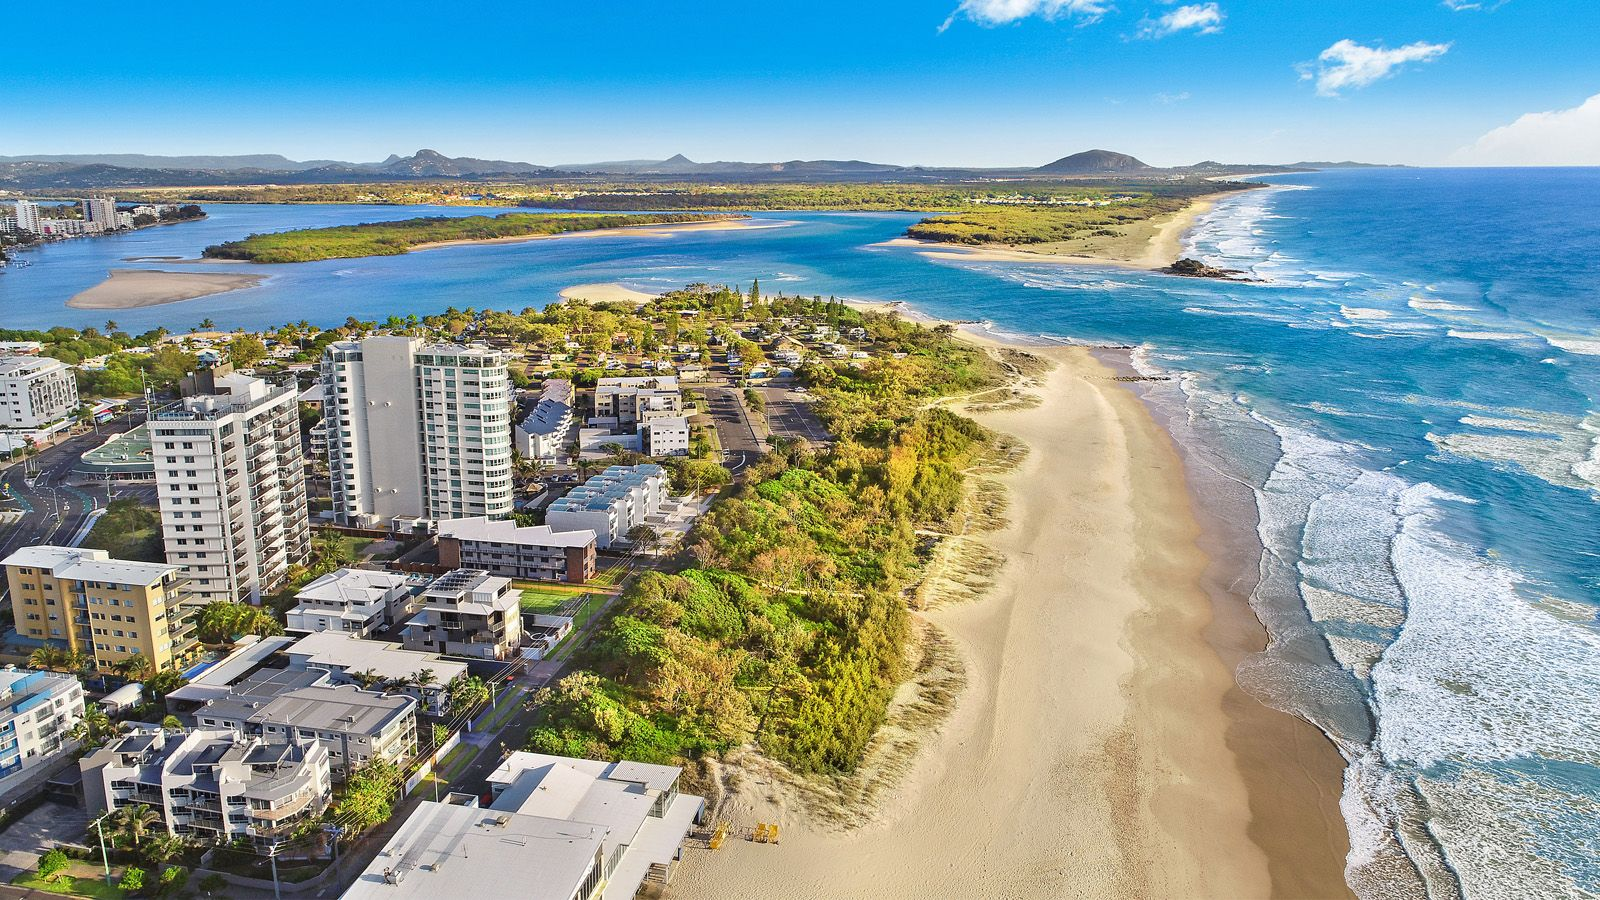 Sixth Ave - Majorca Isle, Maroochydore QLD 4558 - 2 beds ...